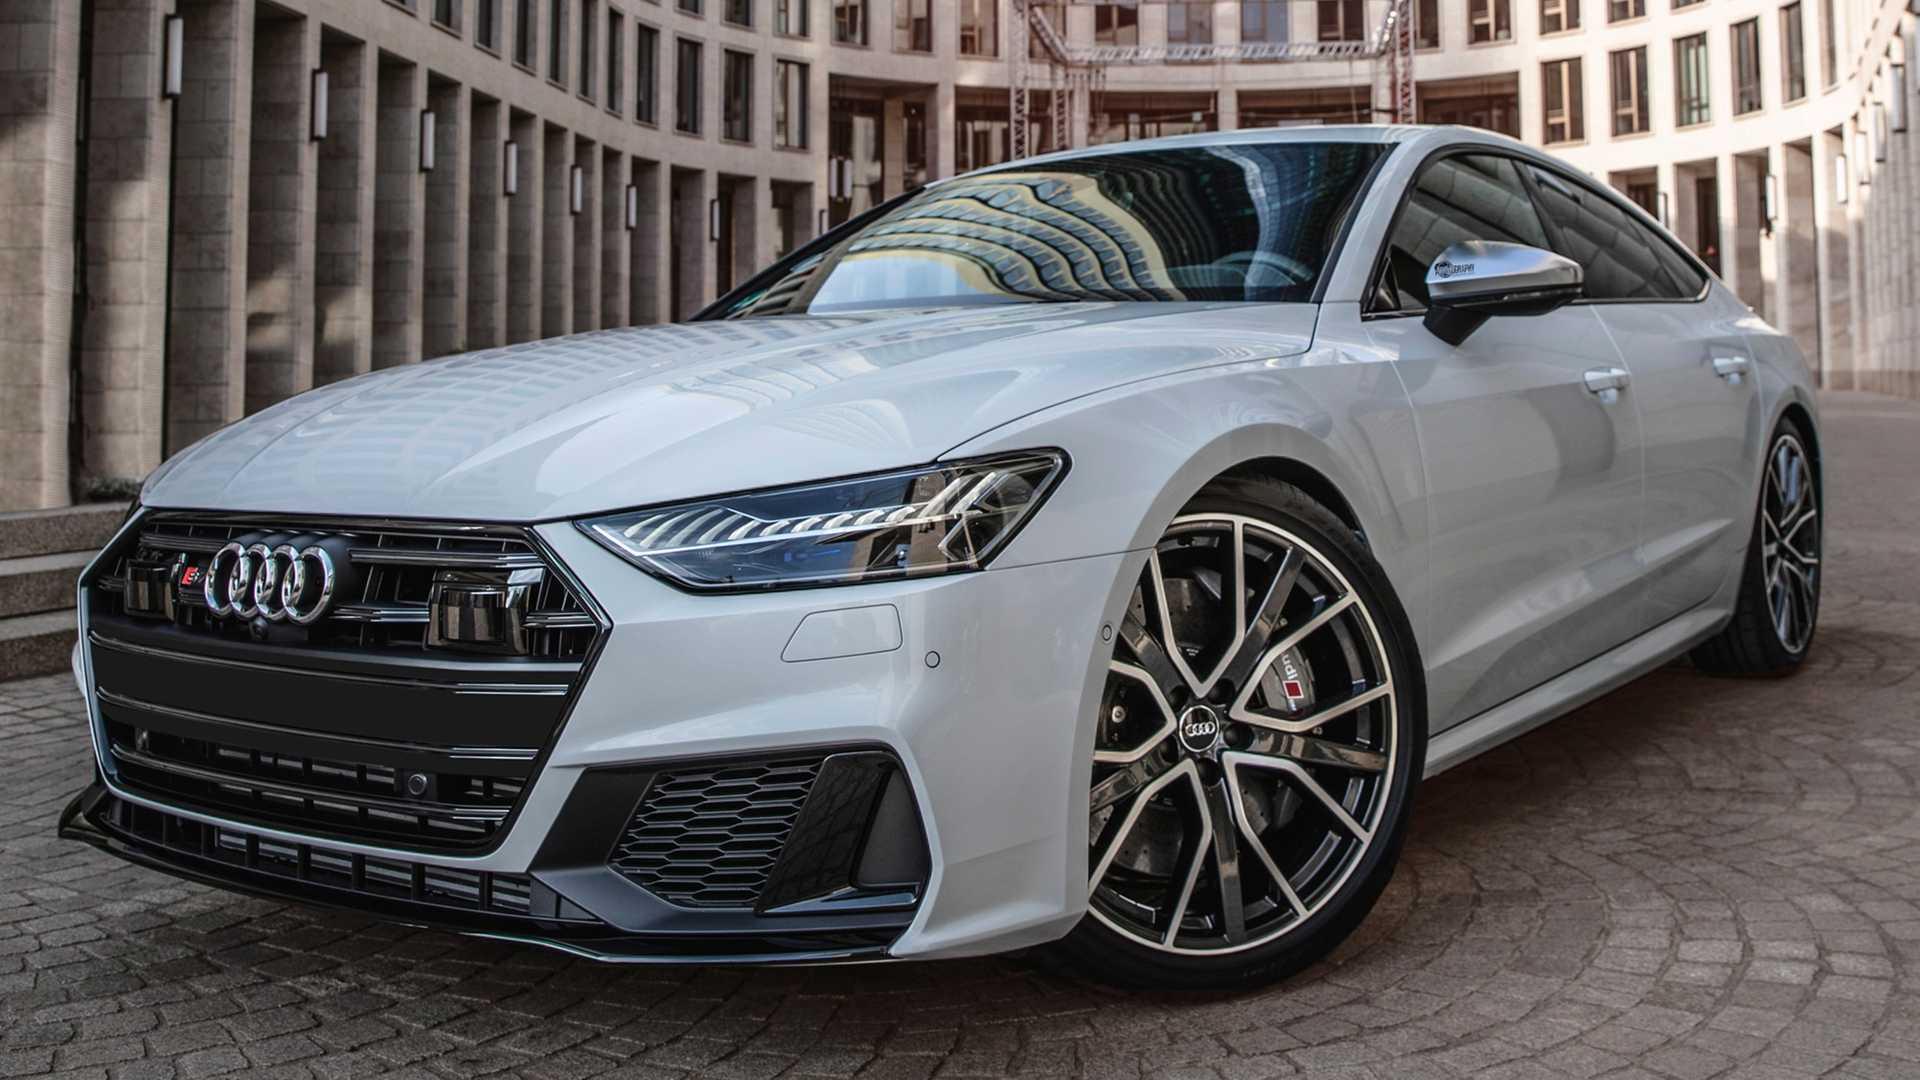 81 New Audi F1 2020 Model with Audi F1 2020